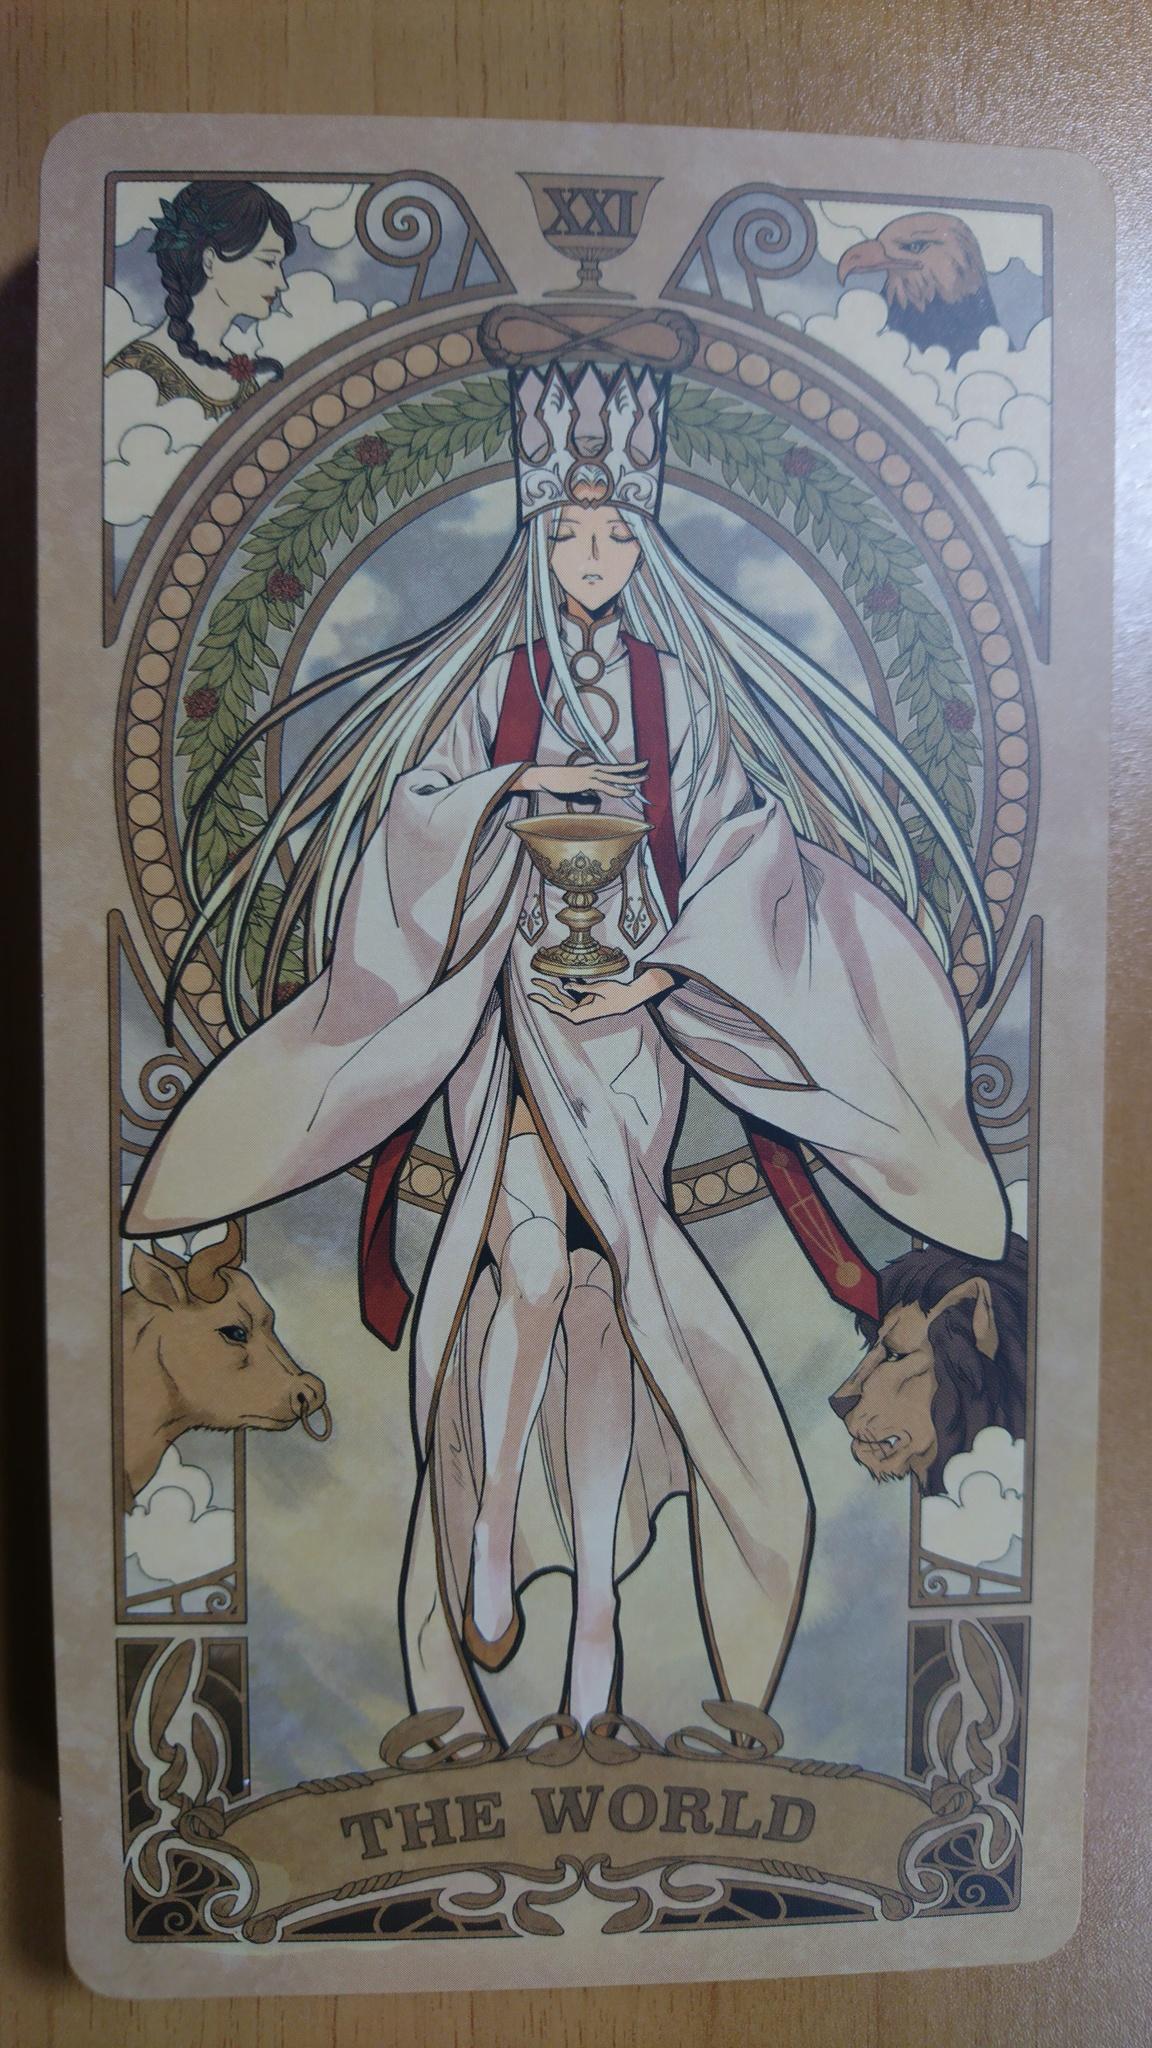 【開箱】FGO同人塔羅 Fate/Journey - manjusaka174的創作 - 巴哈姆特